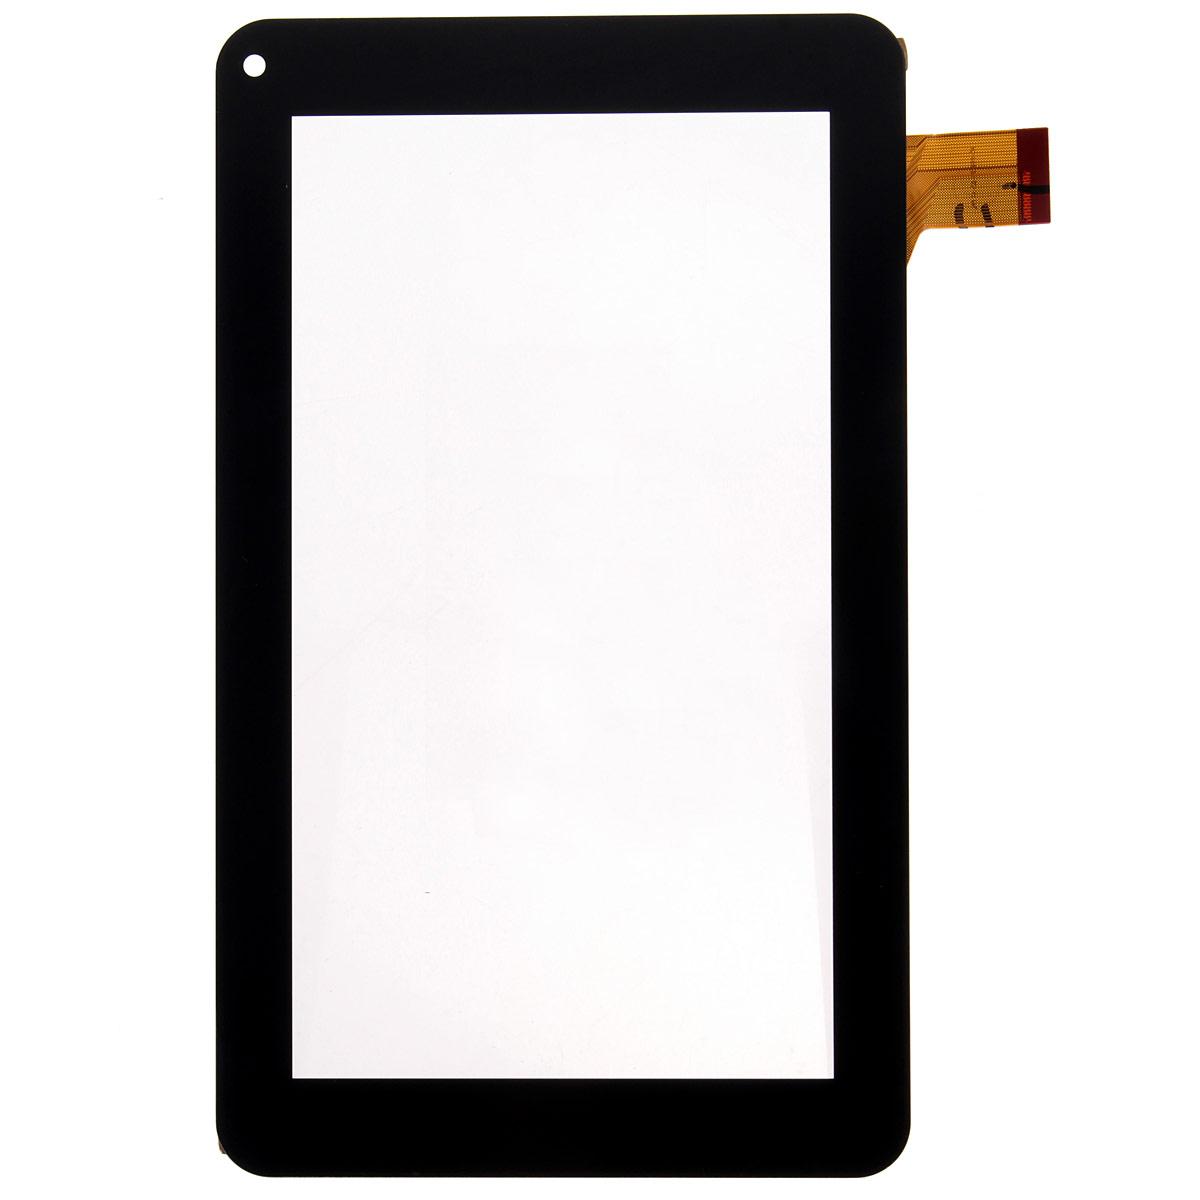 page_finder/tablet | eBay 3 html at master · scrapinghub/page_finder